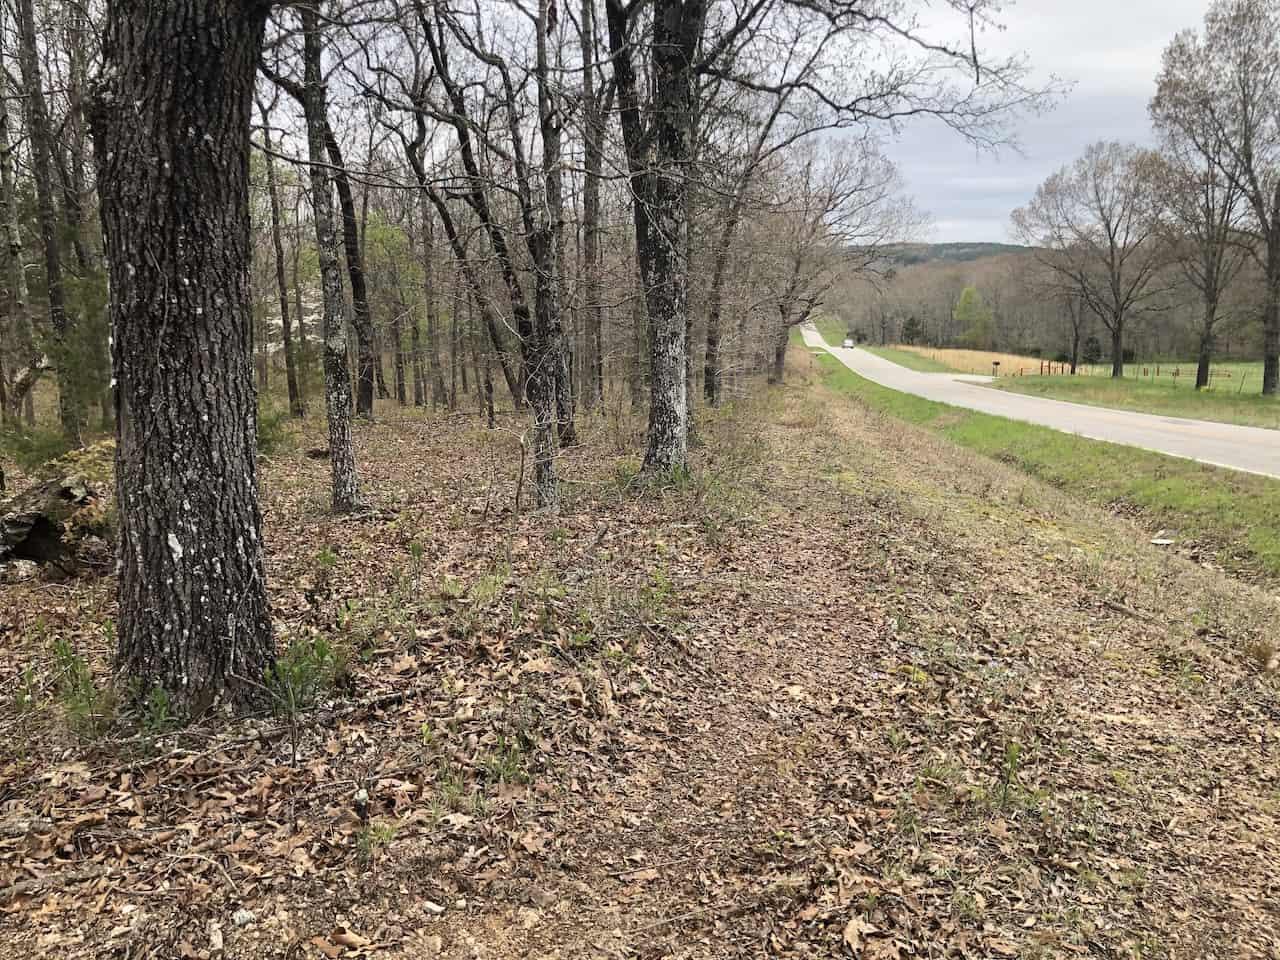 Land for Sale in Southern Missouri Ozarks